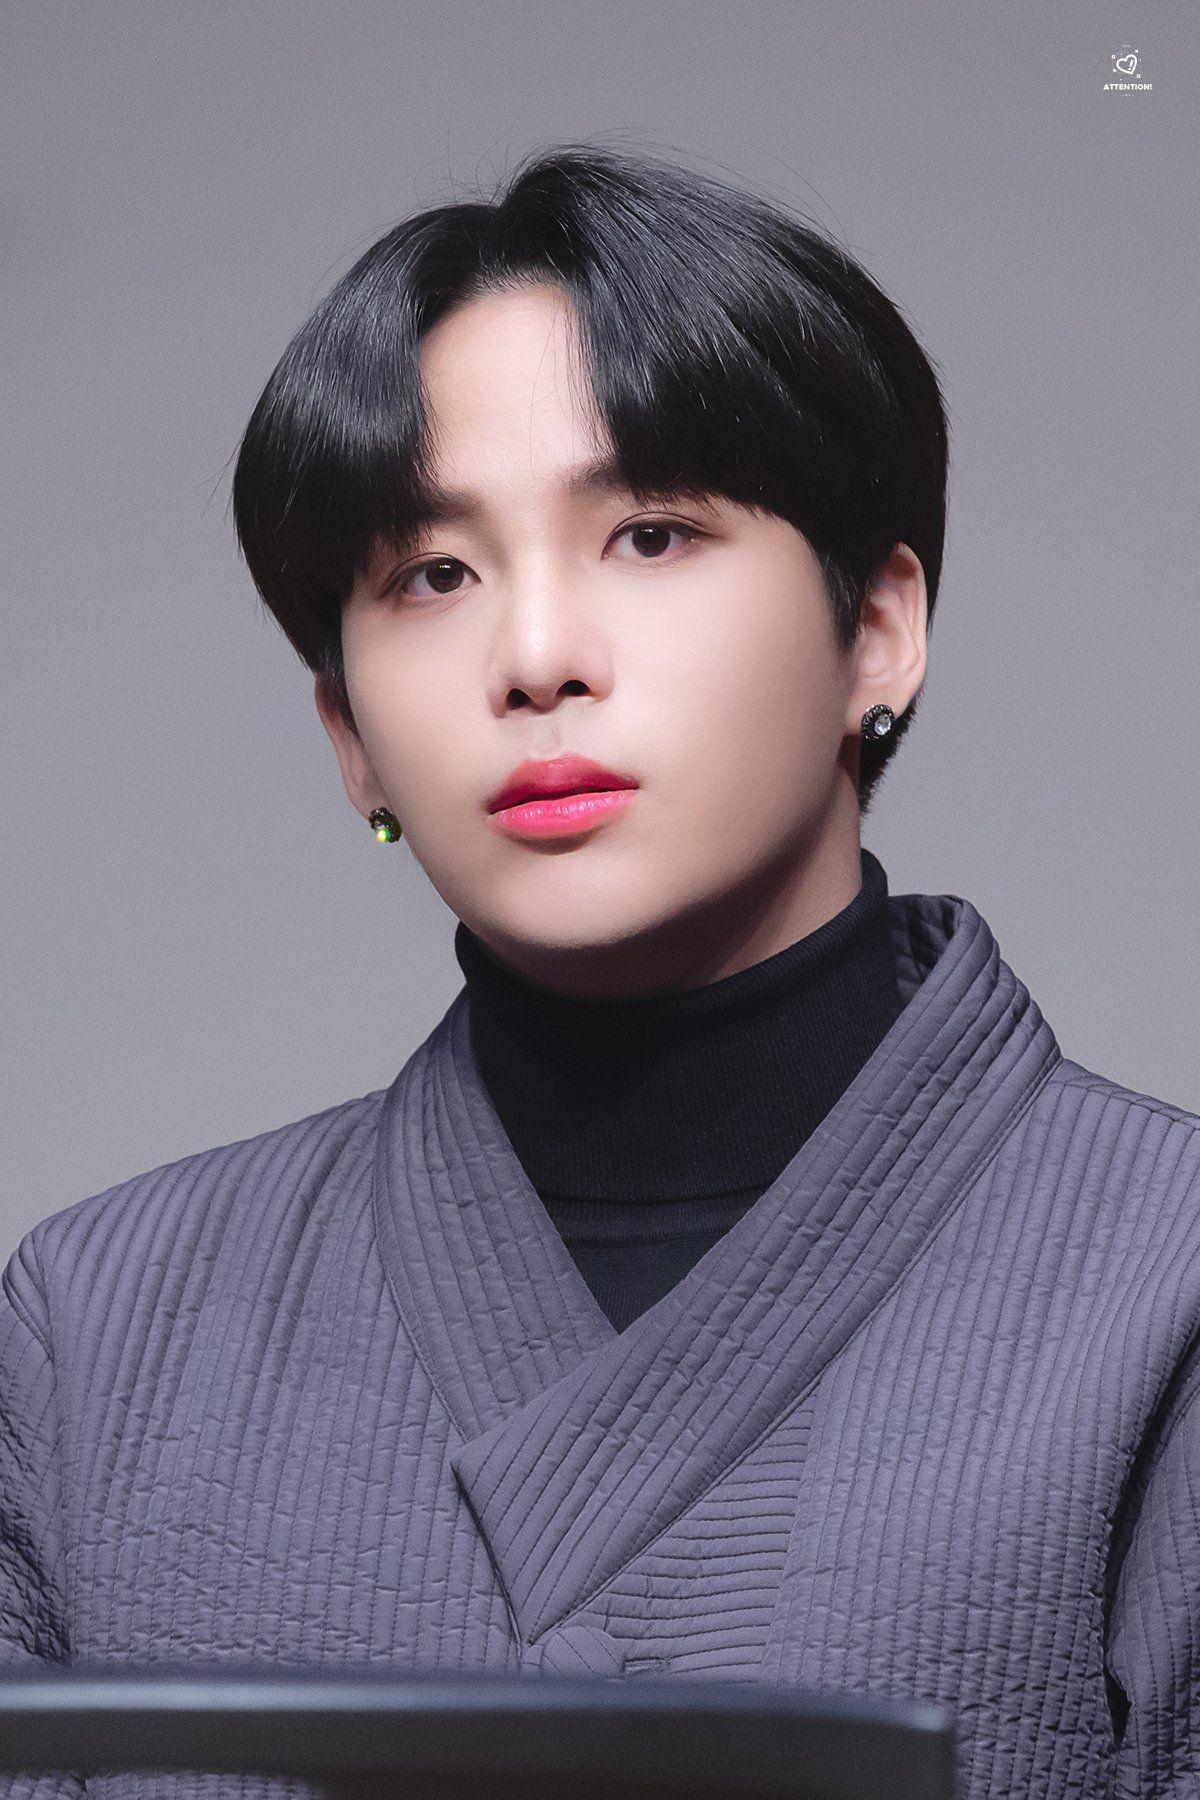 Protect Jongho On In 2020 Kpop Idol You Are My Friend Kpop